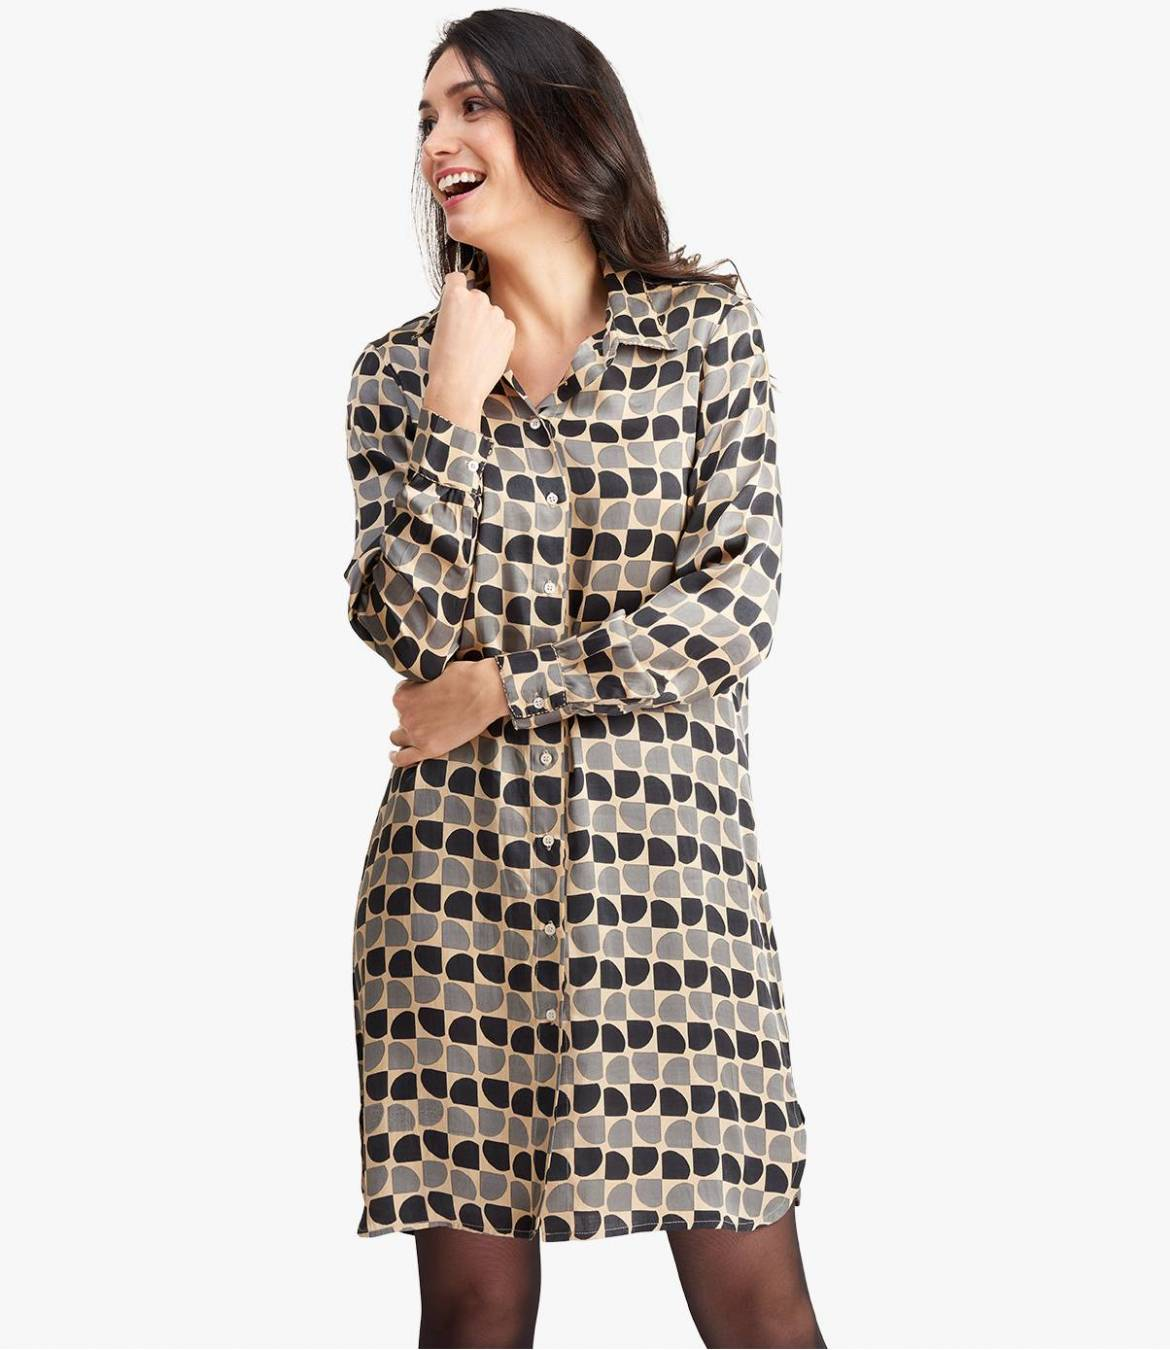 KAIA ARTY Robe en Modal satin pour Femme - 4